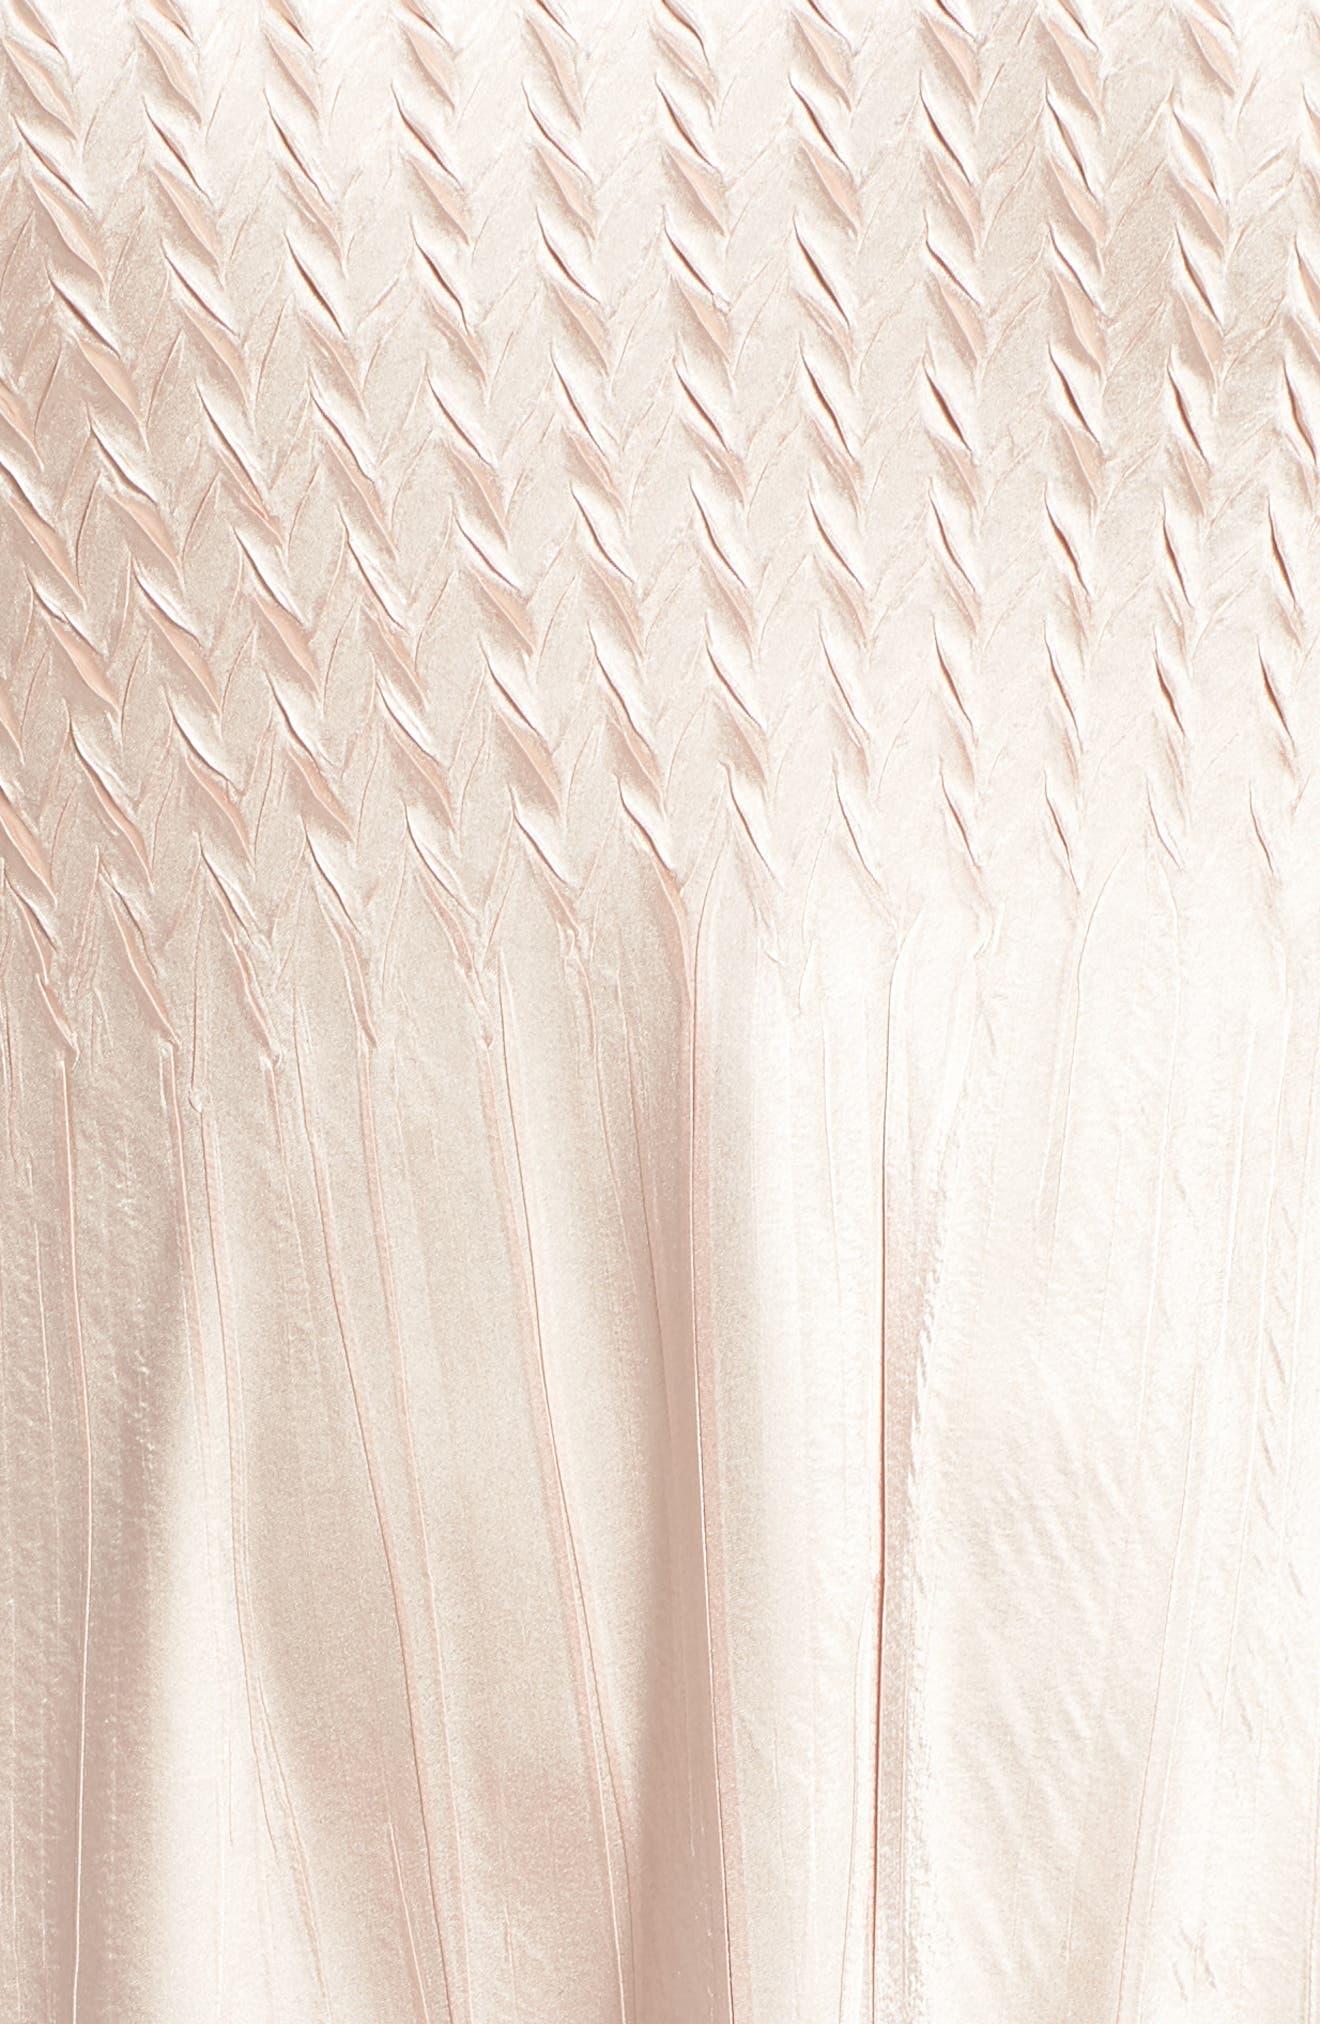 KOMAROV, Tiered Hem Ombré Dress with Jacket, Alternate thumbnail 6, color, VINTAGE ROSE WITH CAFE OMBRE